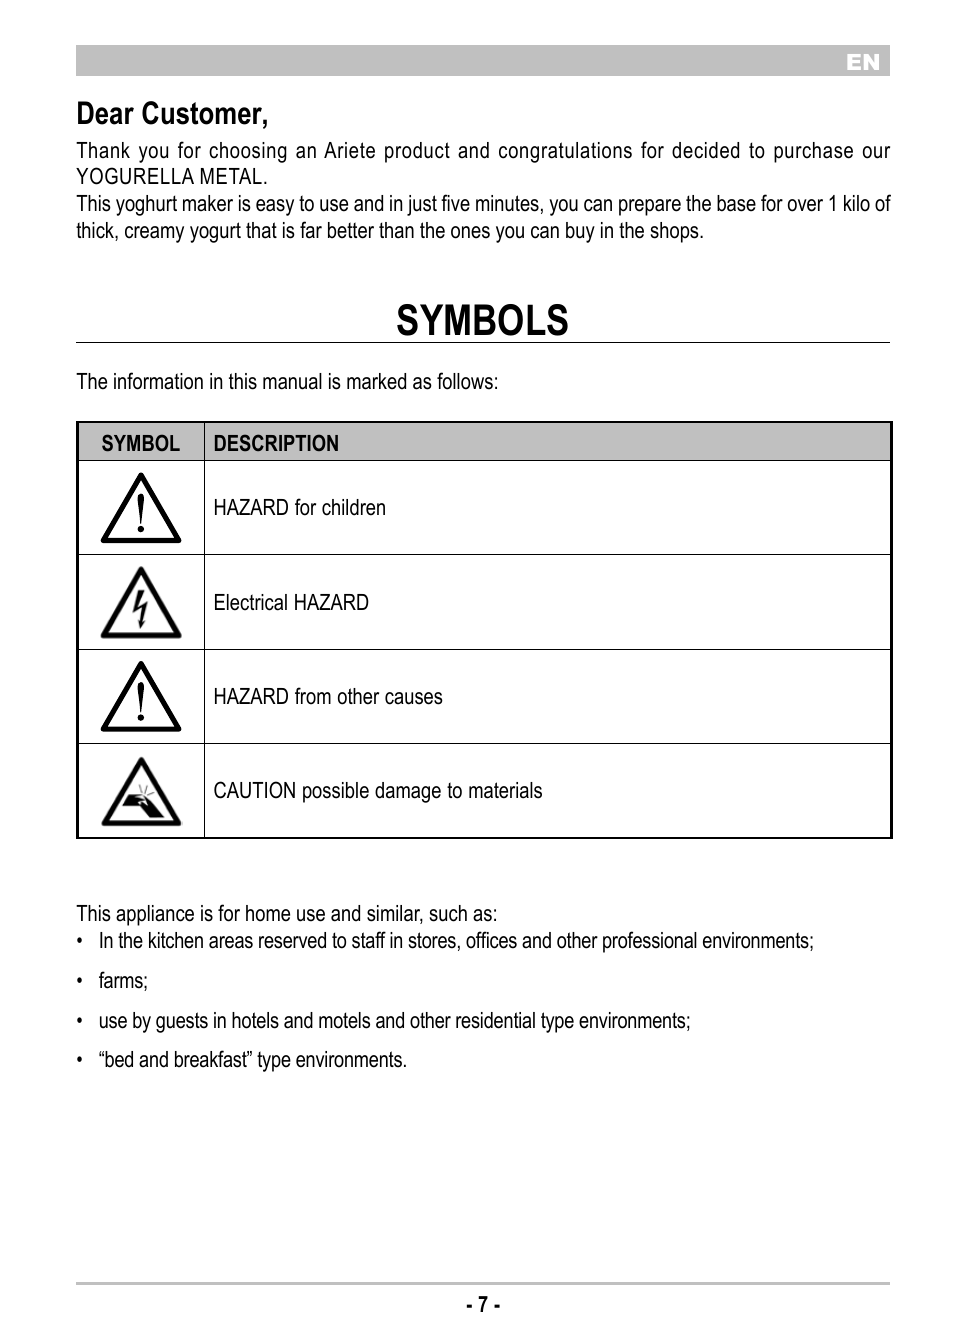 Symbols Dear Customer Ariete Yogurella Metal 620 User Manual